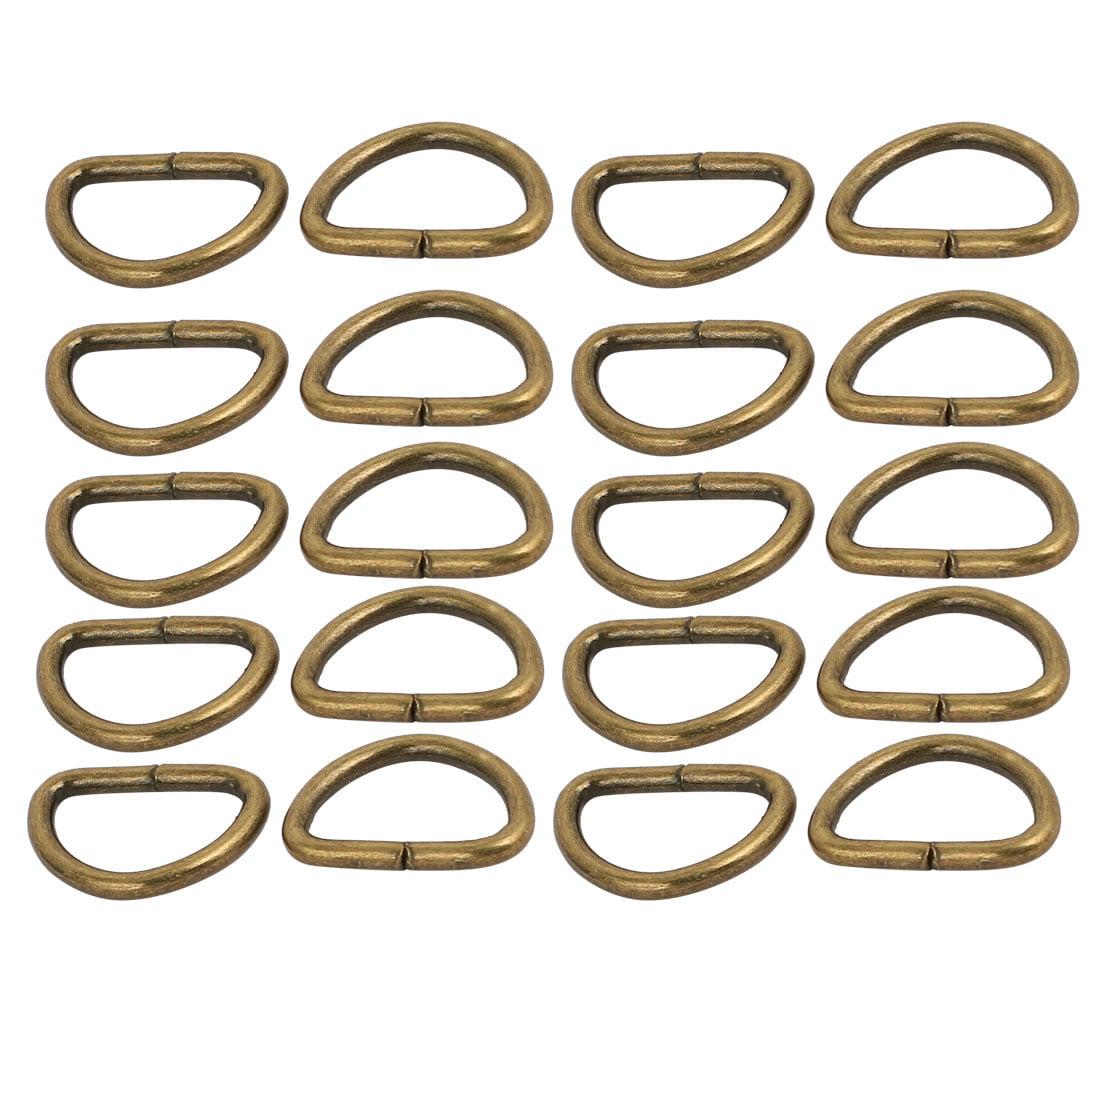 Unique Bargains 10mm Inner Width Metal Half Round Non Welded D Ring Bronze Tone 20pcs